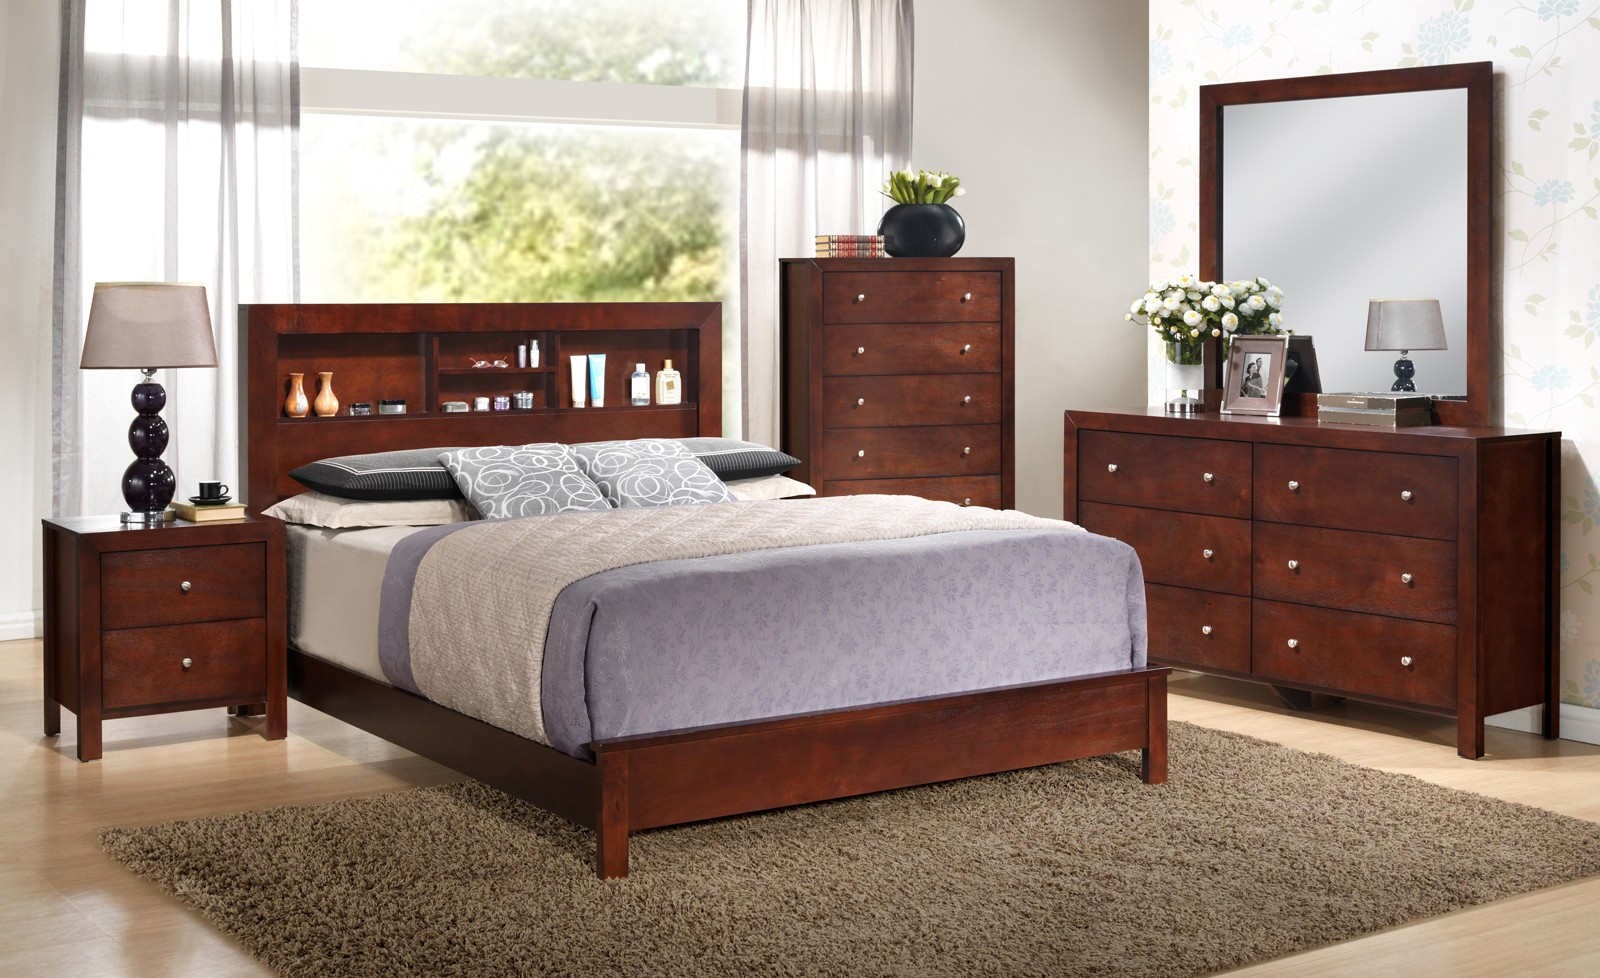 Glory Furniture G2400 King Bookcase Headboard Bed In Cherry G2400b Kb2